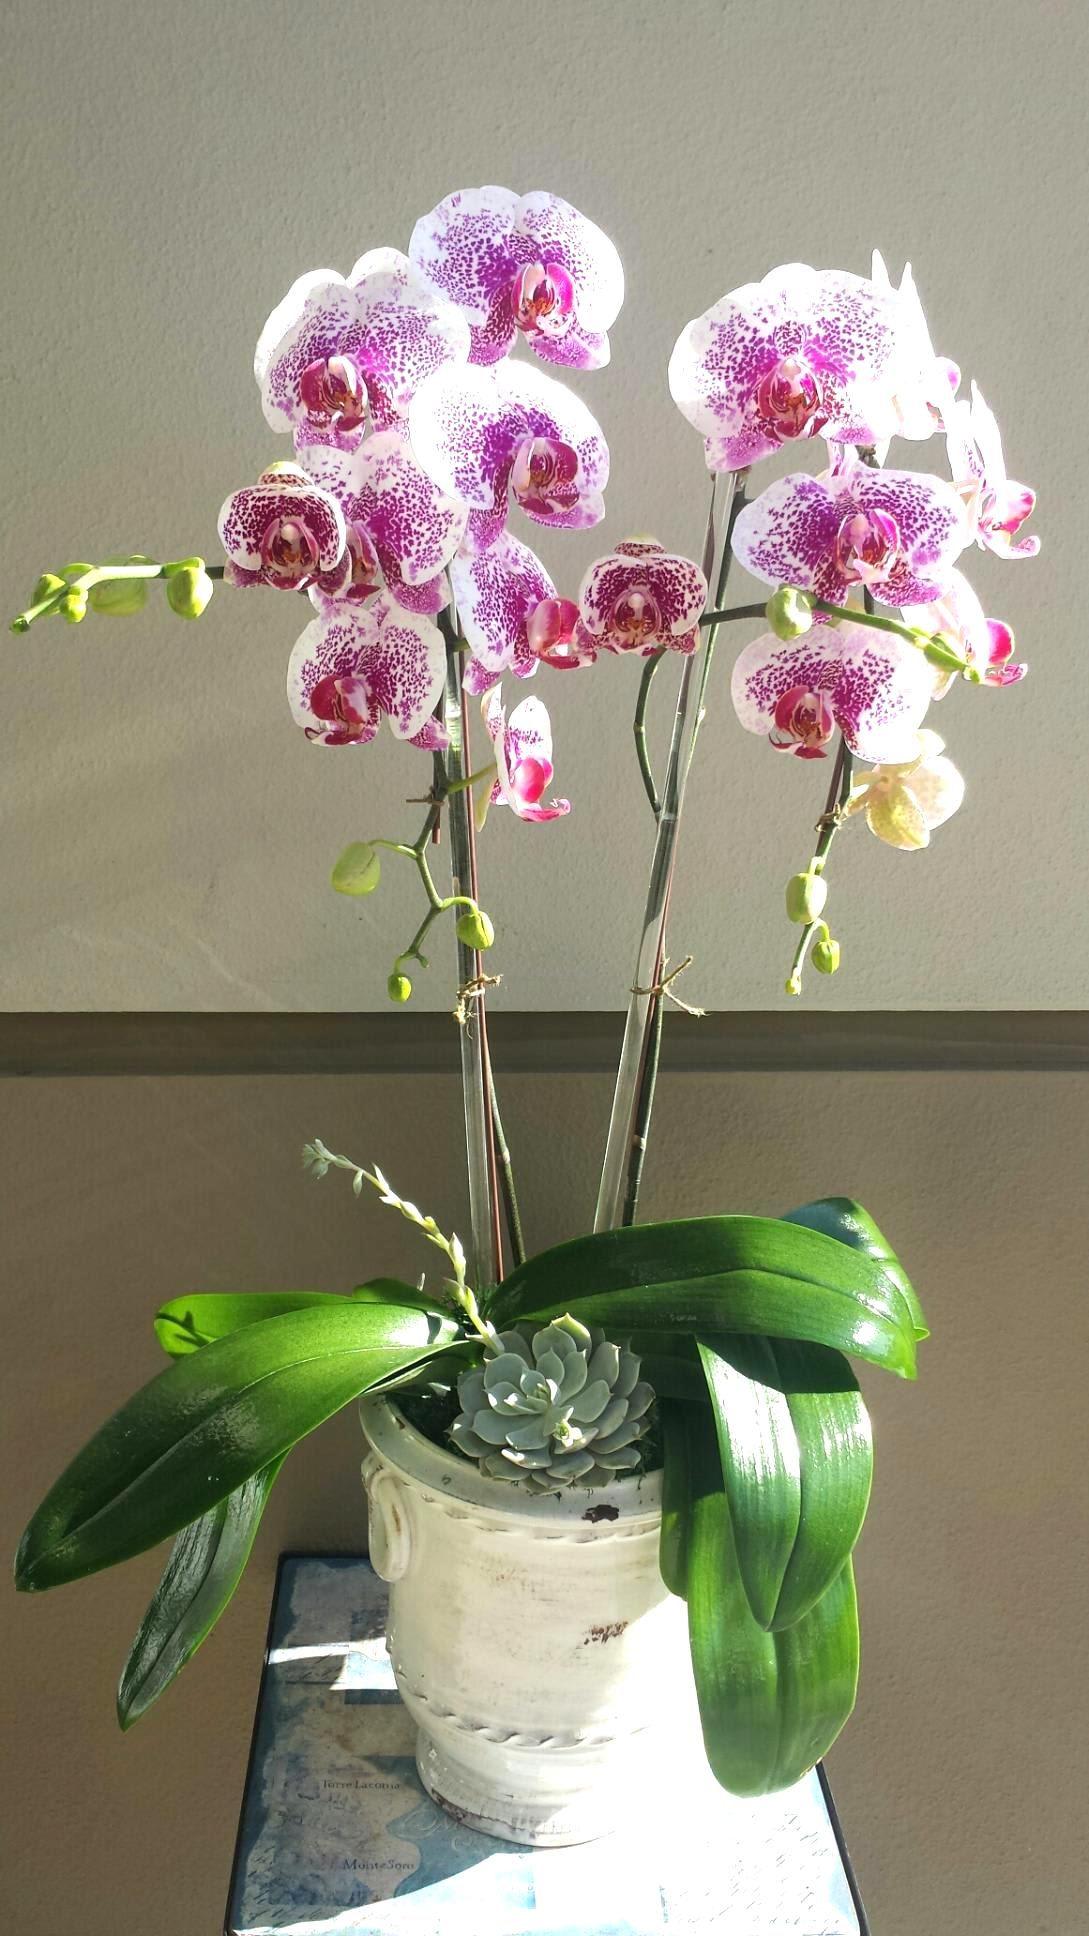 Phaleonopsis Orchid In 2020 Phalaenopsis Orchid Care Orchids Phalaenopsis Orchid